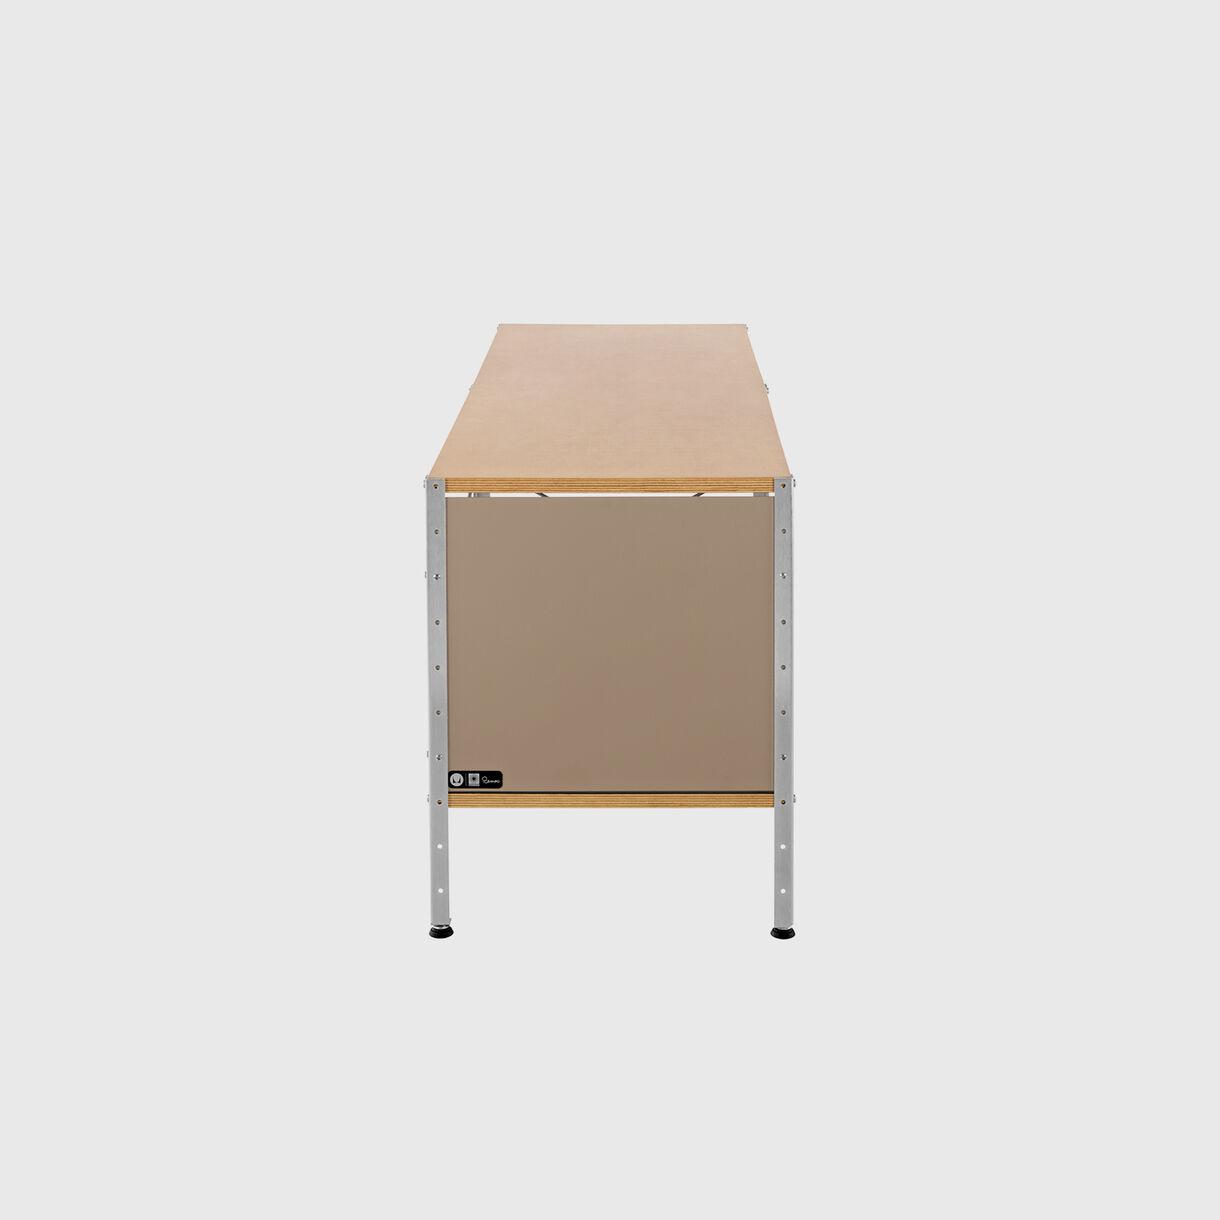 Eames Storage Unit, 1x2